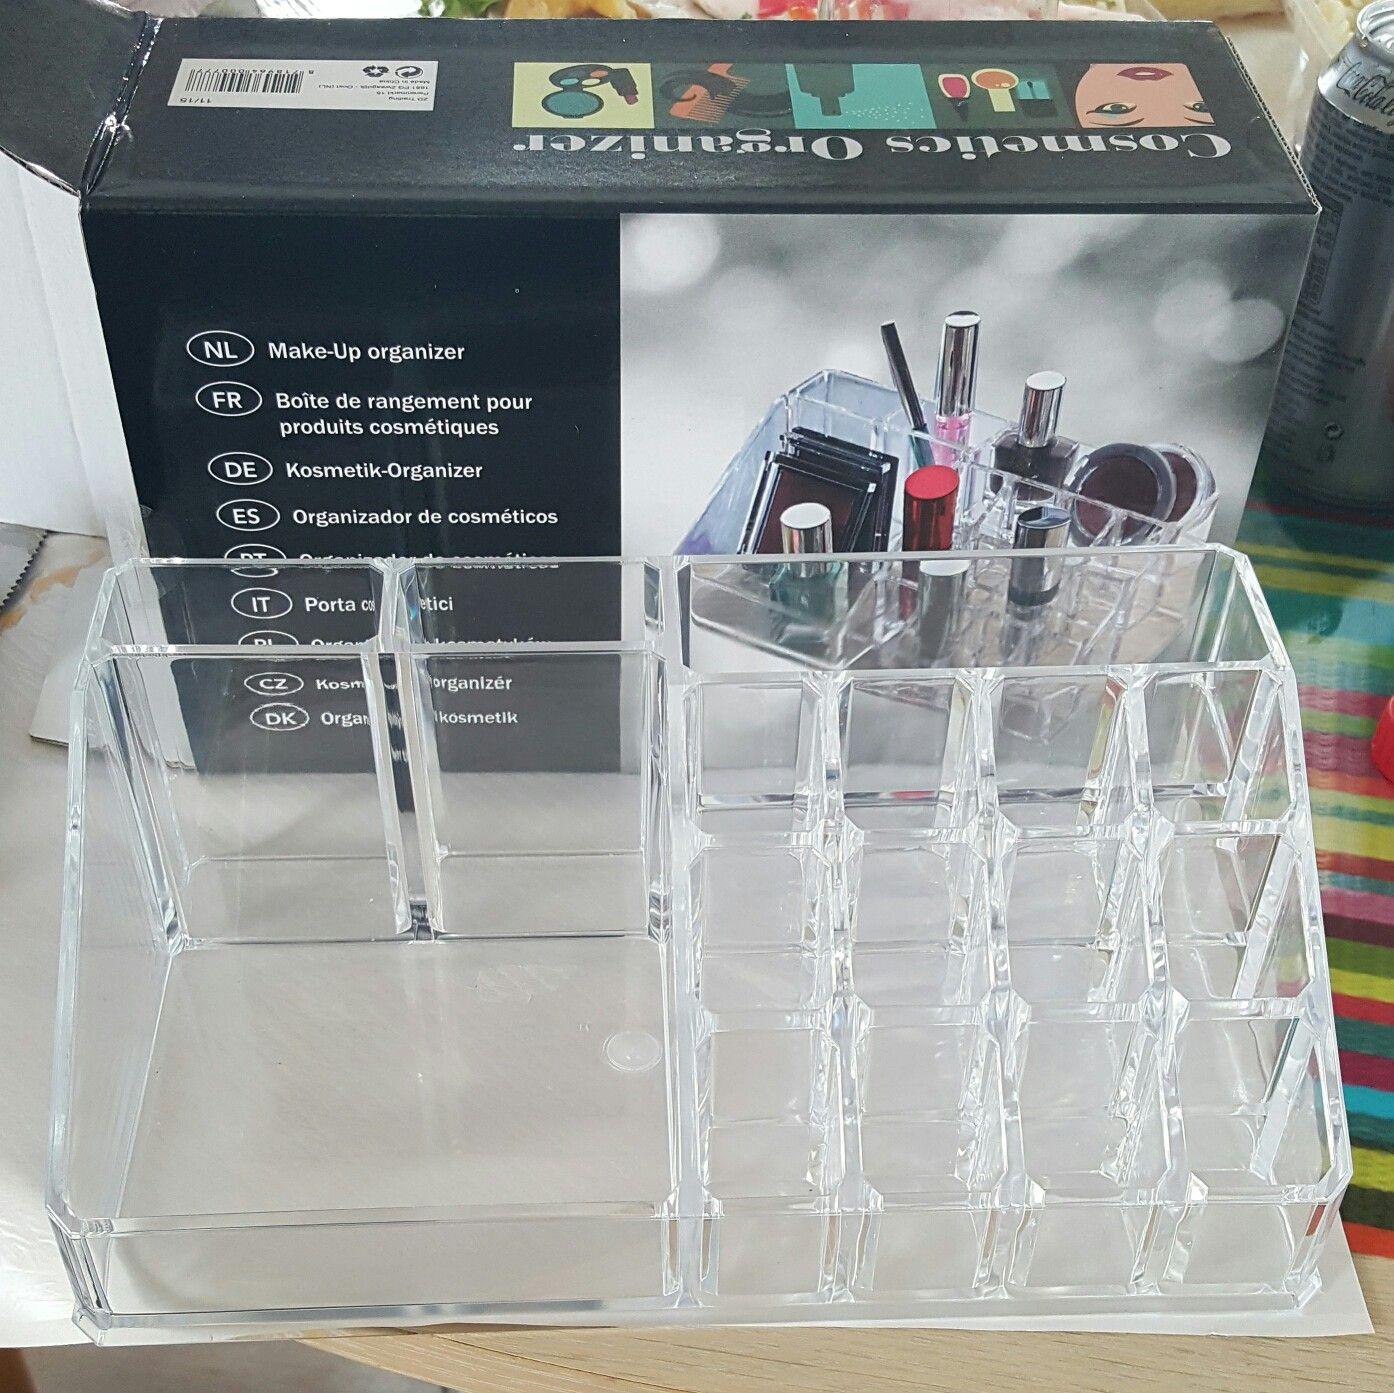 Rangement Makeup De Chez Action Rangement Makeup Boite De Rangement Organisation Quotidienne